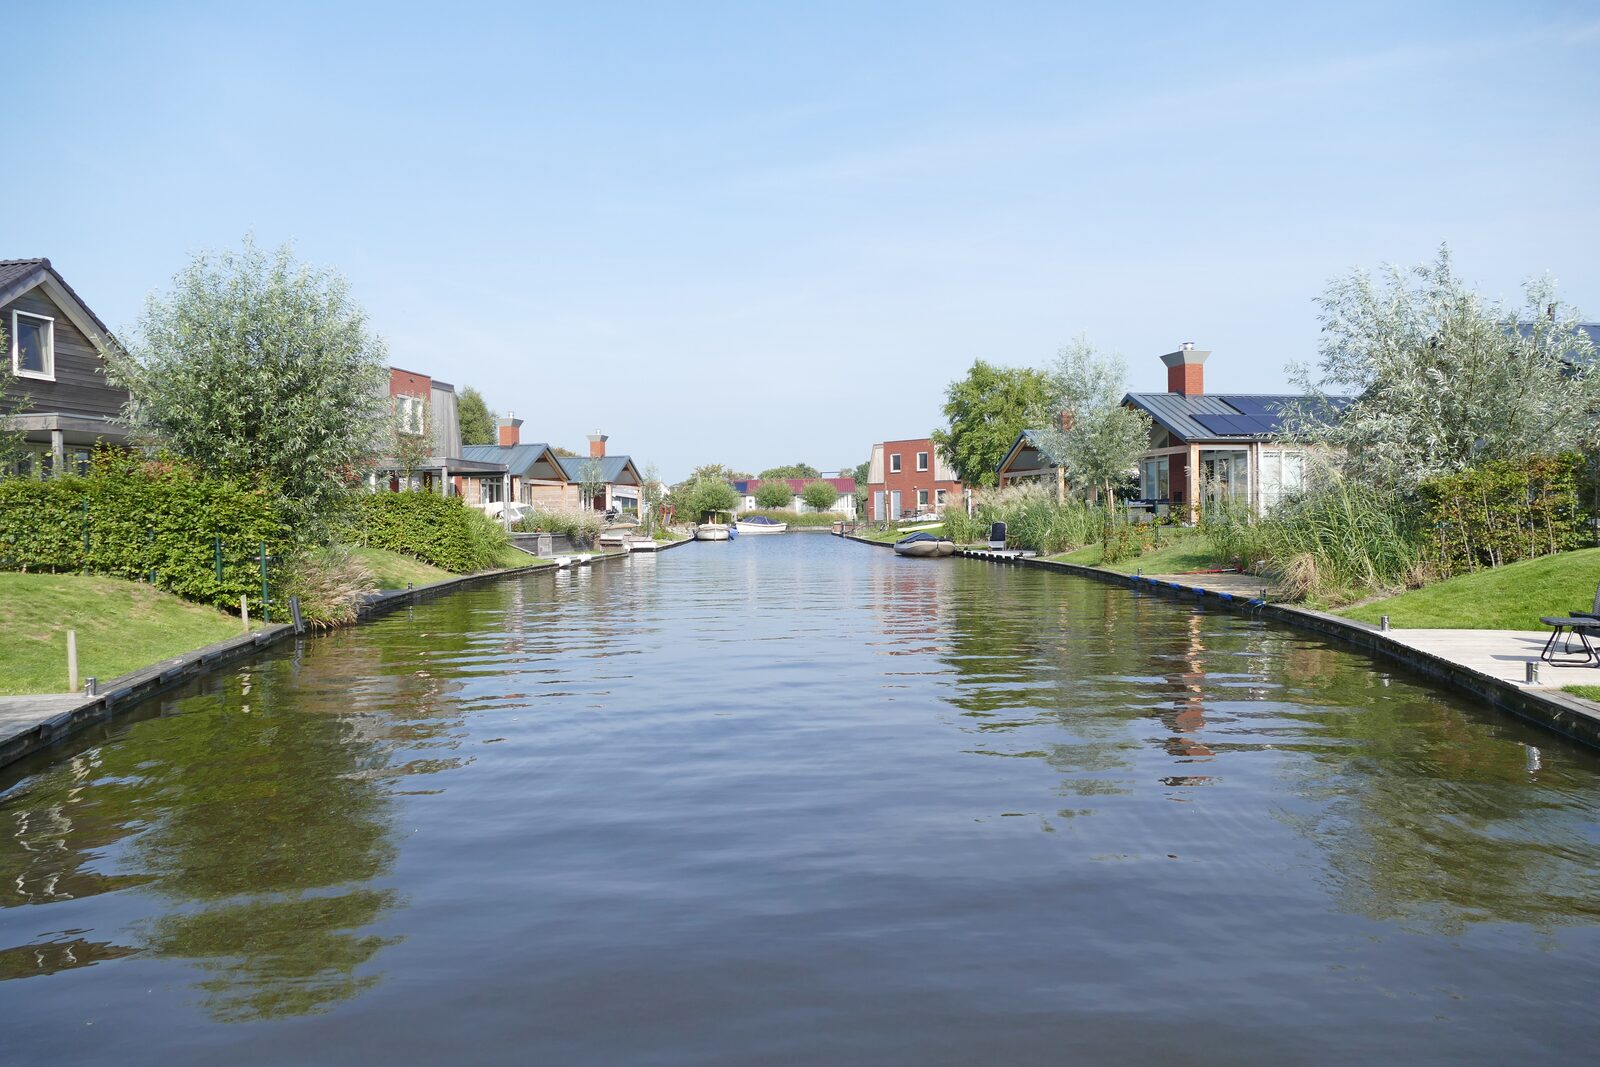 Tusken de Marren - Holiday park in Frisia